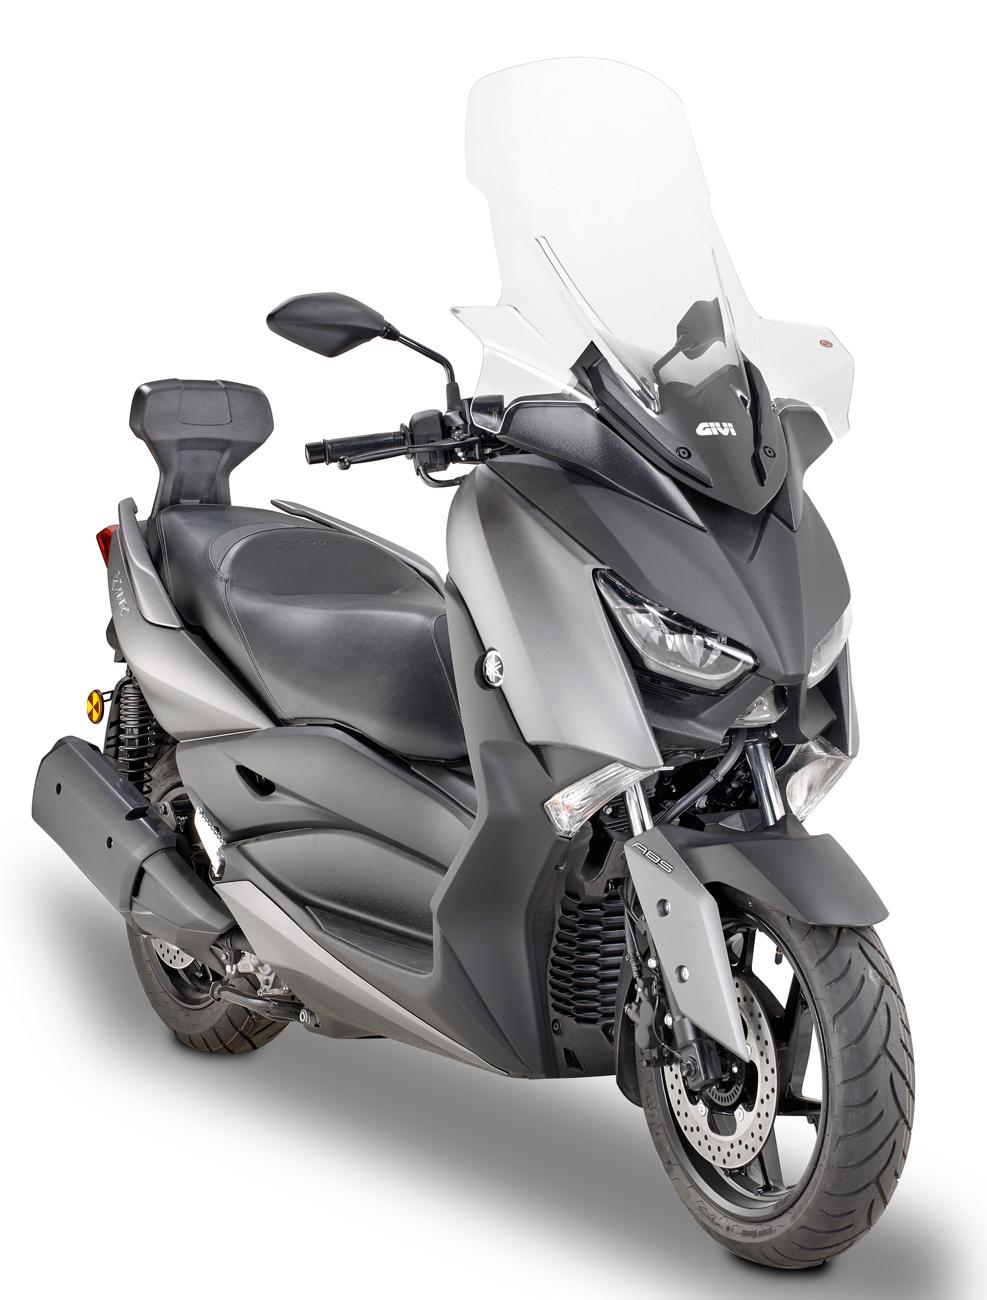 GIVI Backrest for Yamaha X-Max 125 18-, X-Max 300, X-Max 400 18-